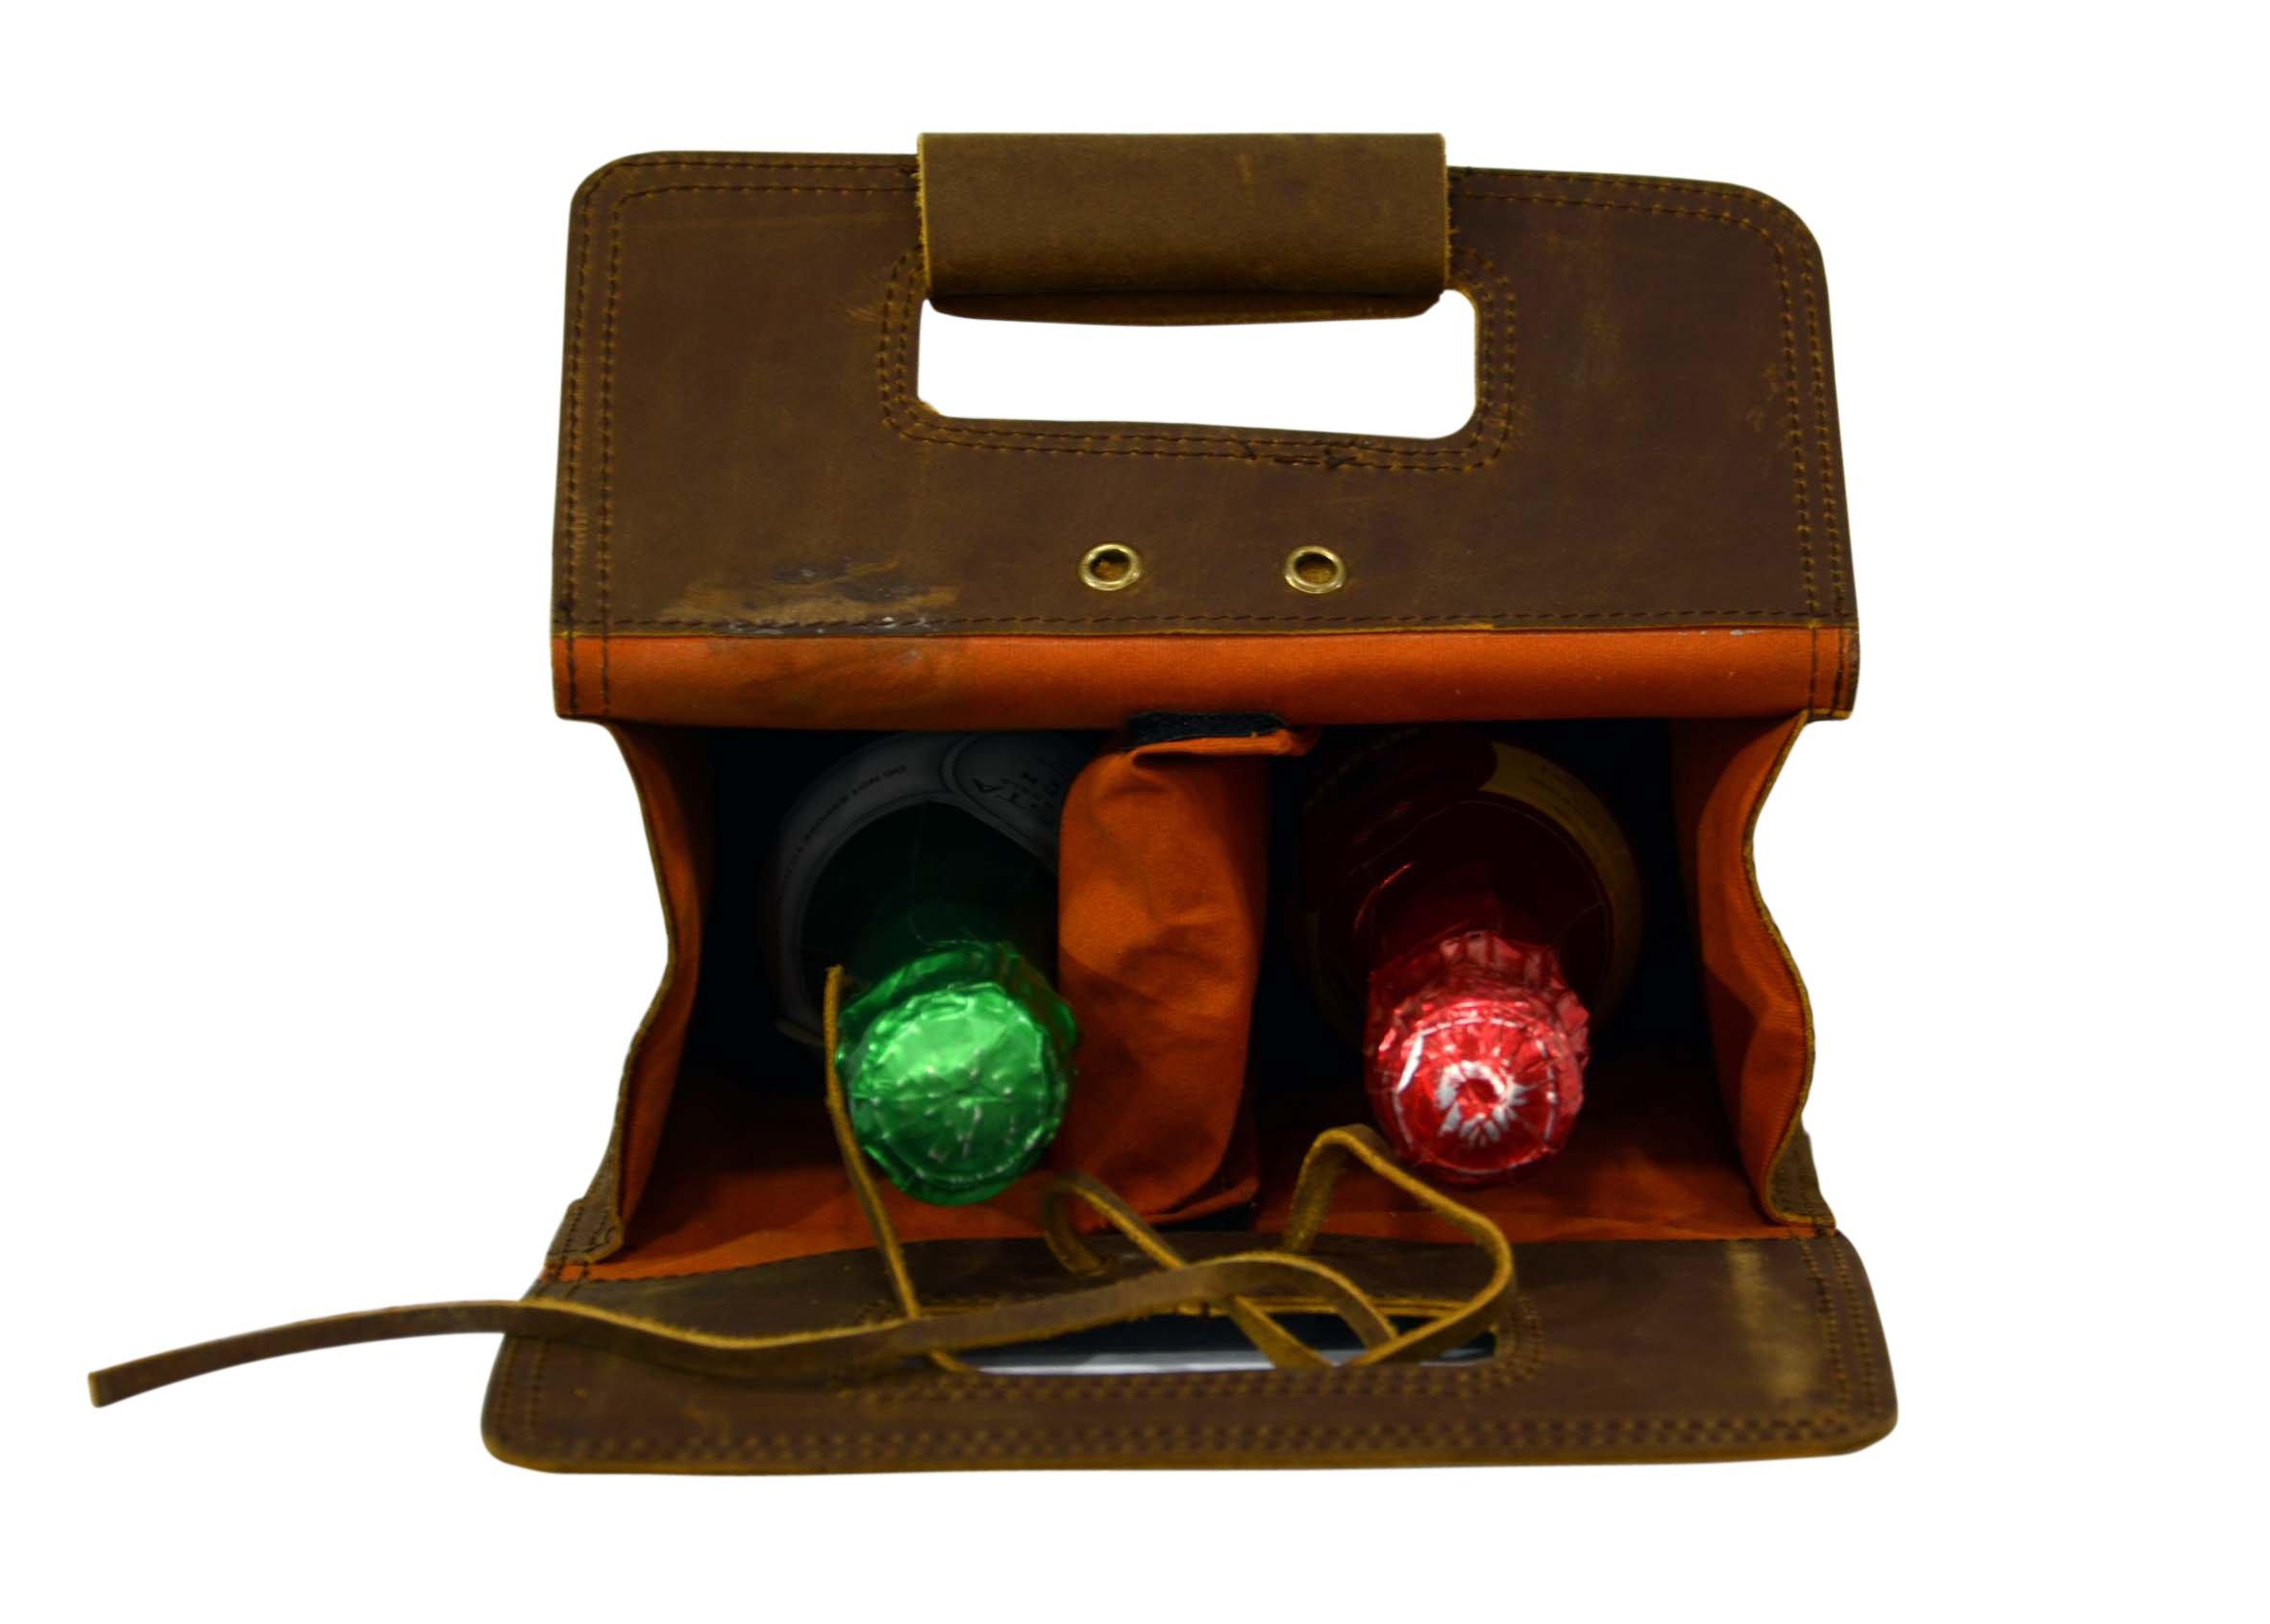 Double Wine Bottle Carrier Bag Leather Bottle Holder Tote Reusable Gift Bag Champagne Case, Valentines Gift Bag by ECOCRAFTWORLD (Image #4)